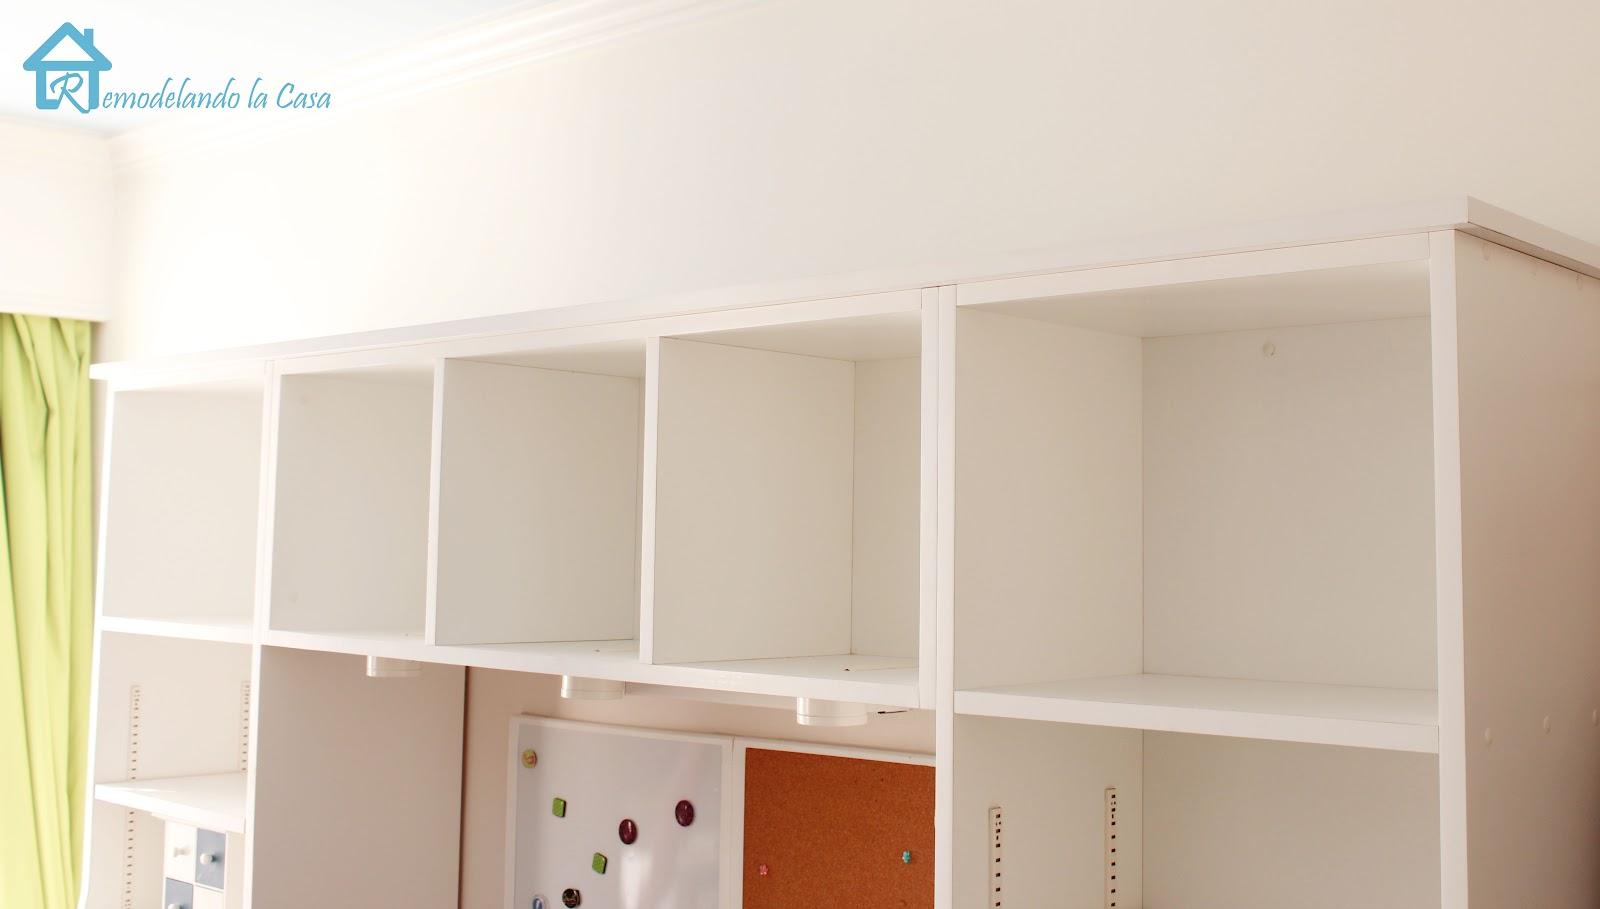 adding crown molding to the top of bookcases - remodelando la casa